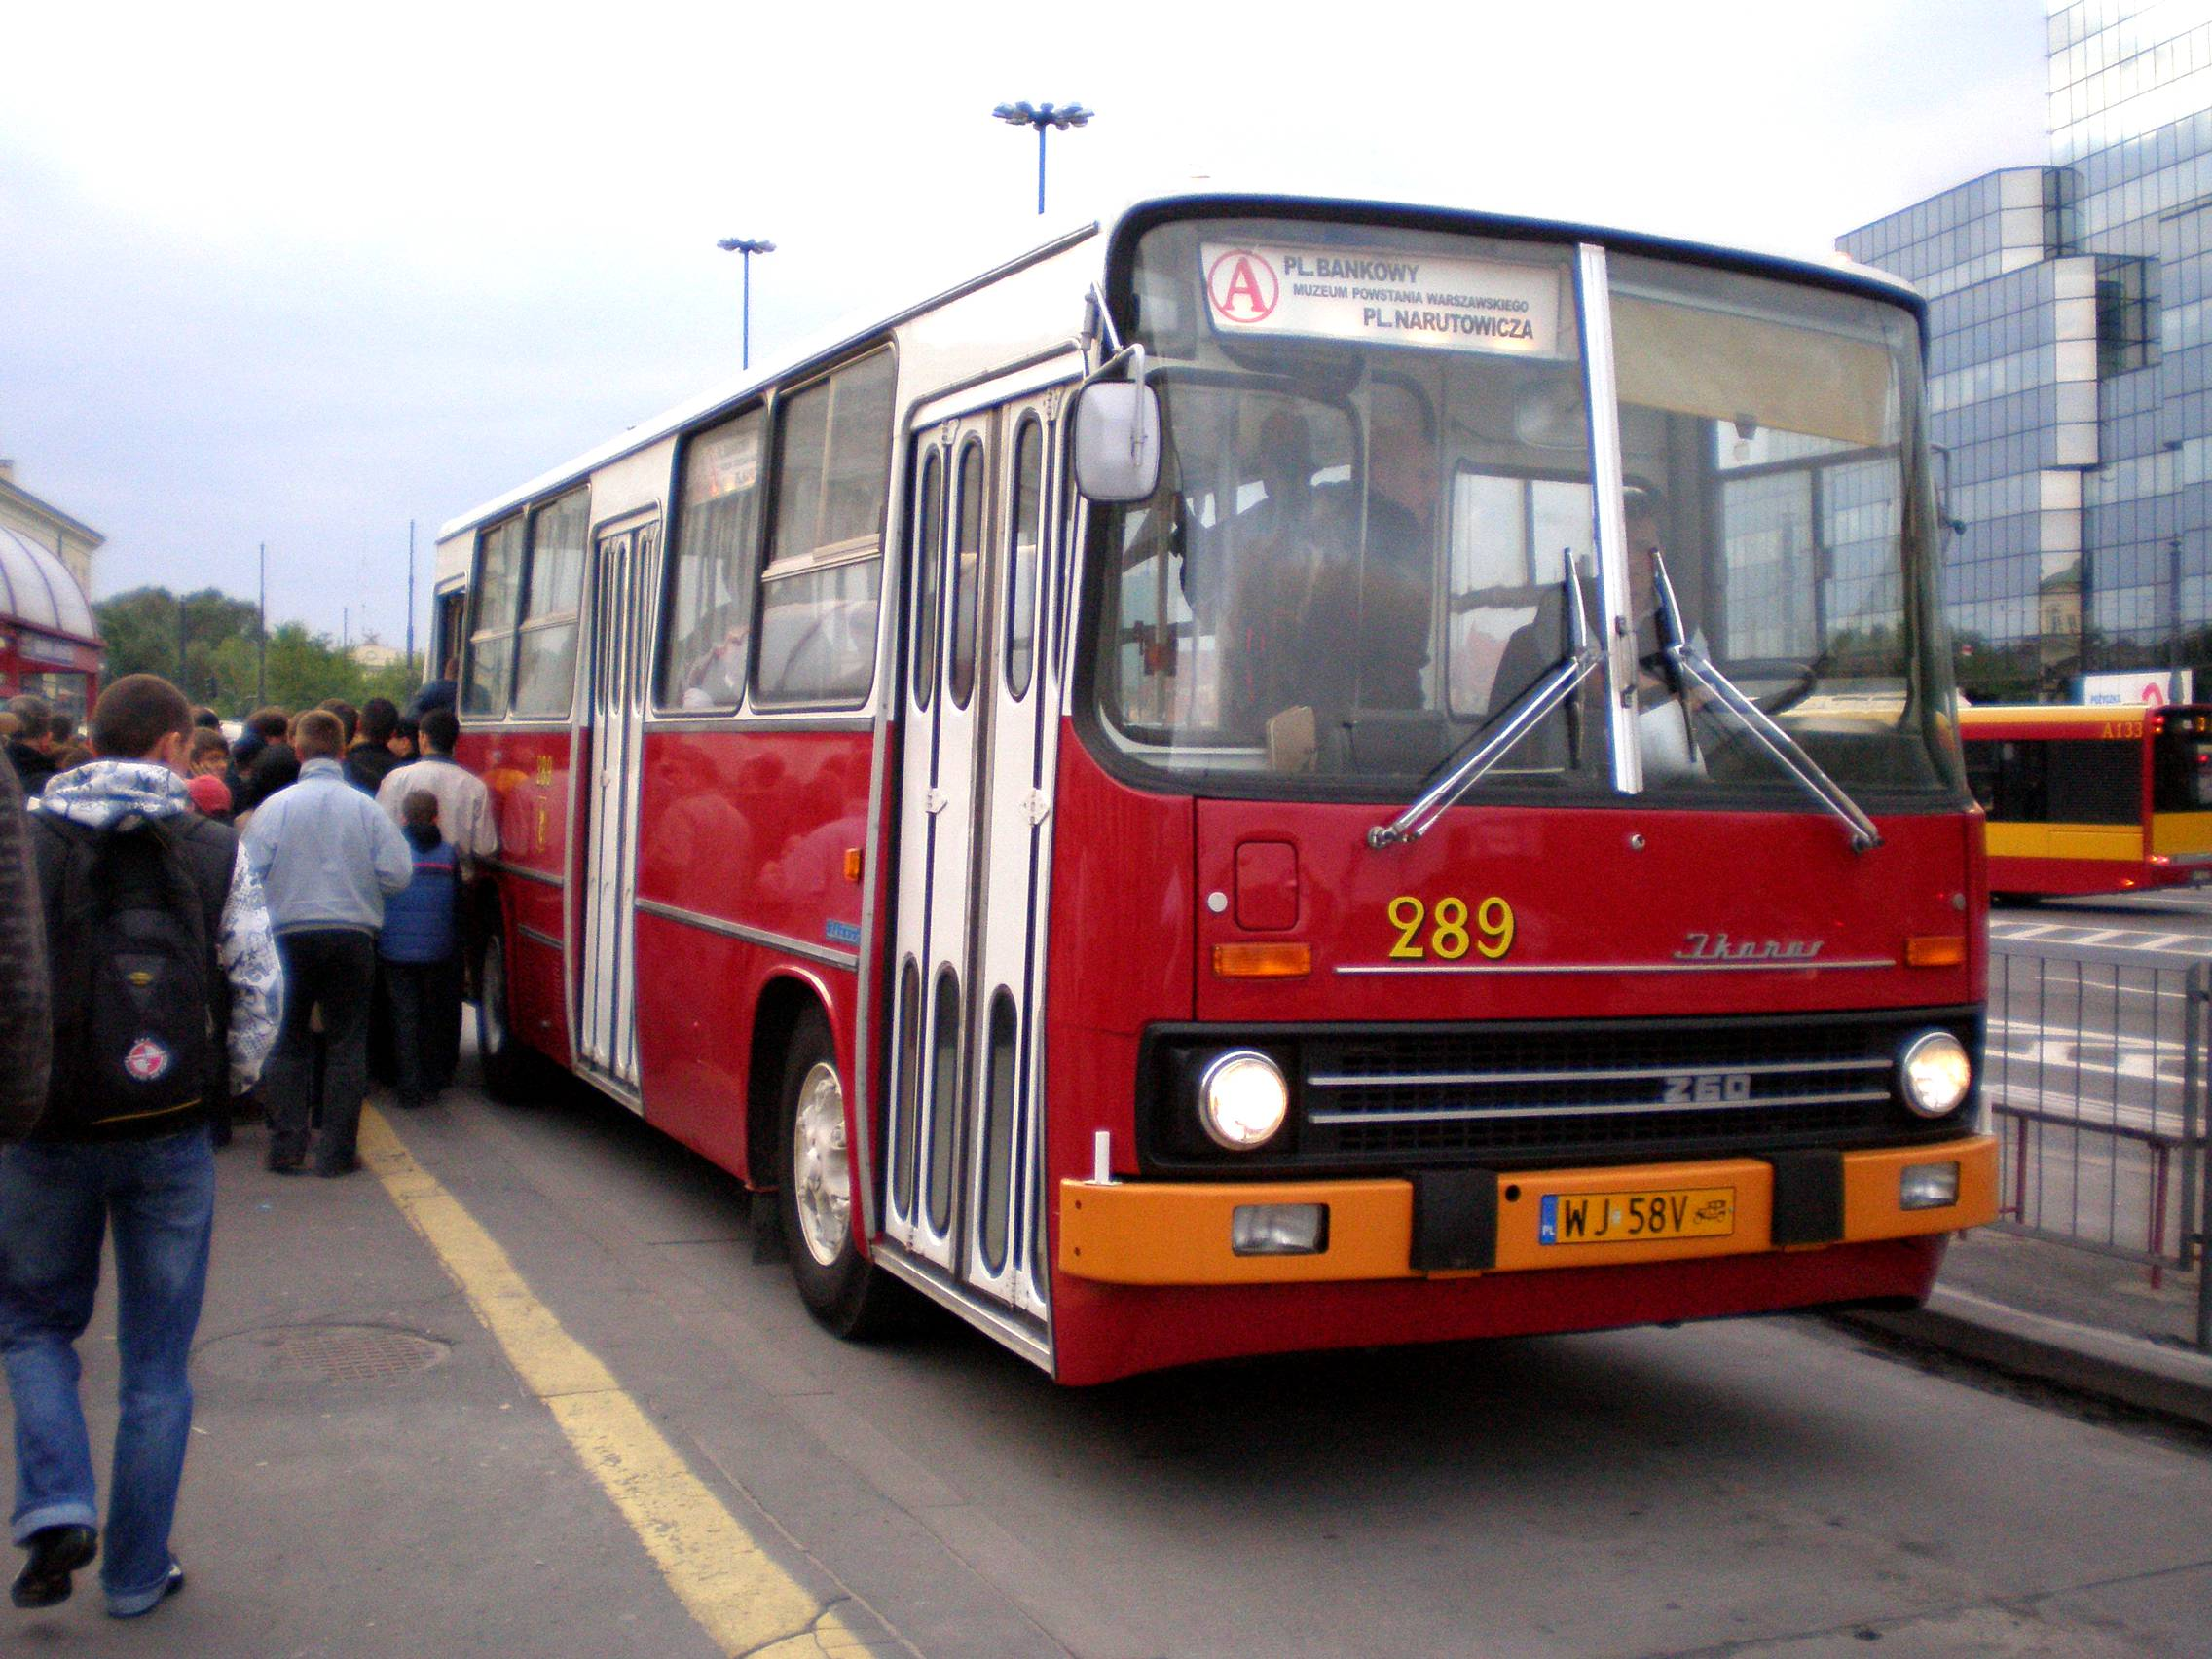 A (linia autobusowa)